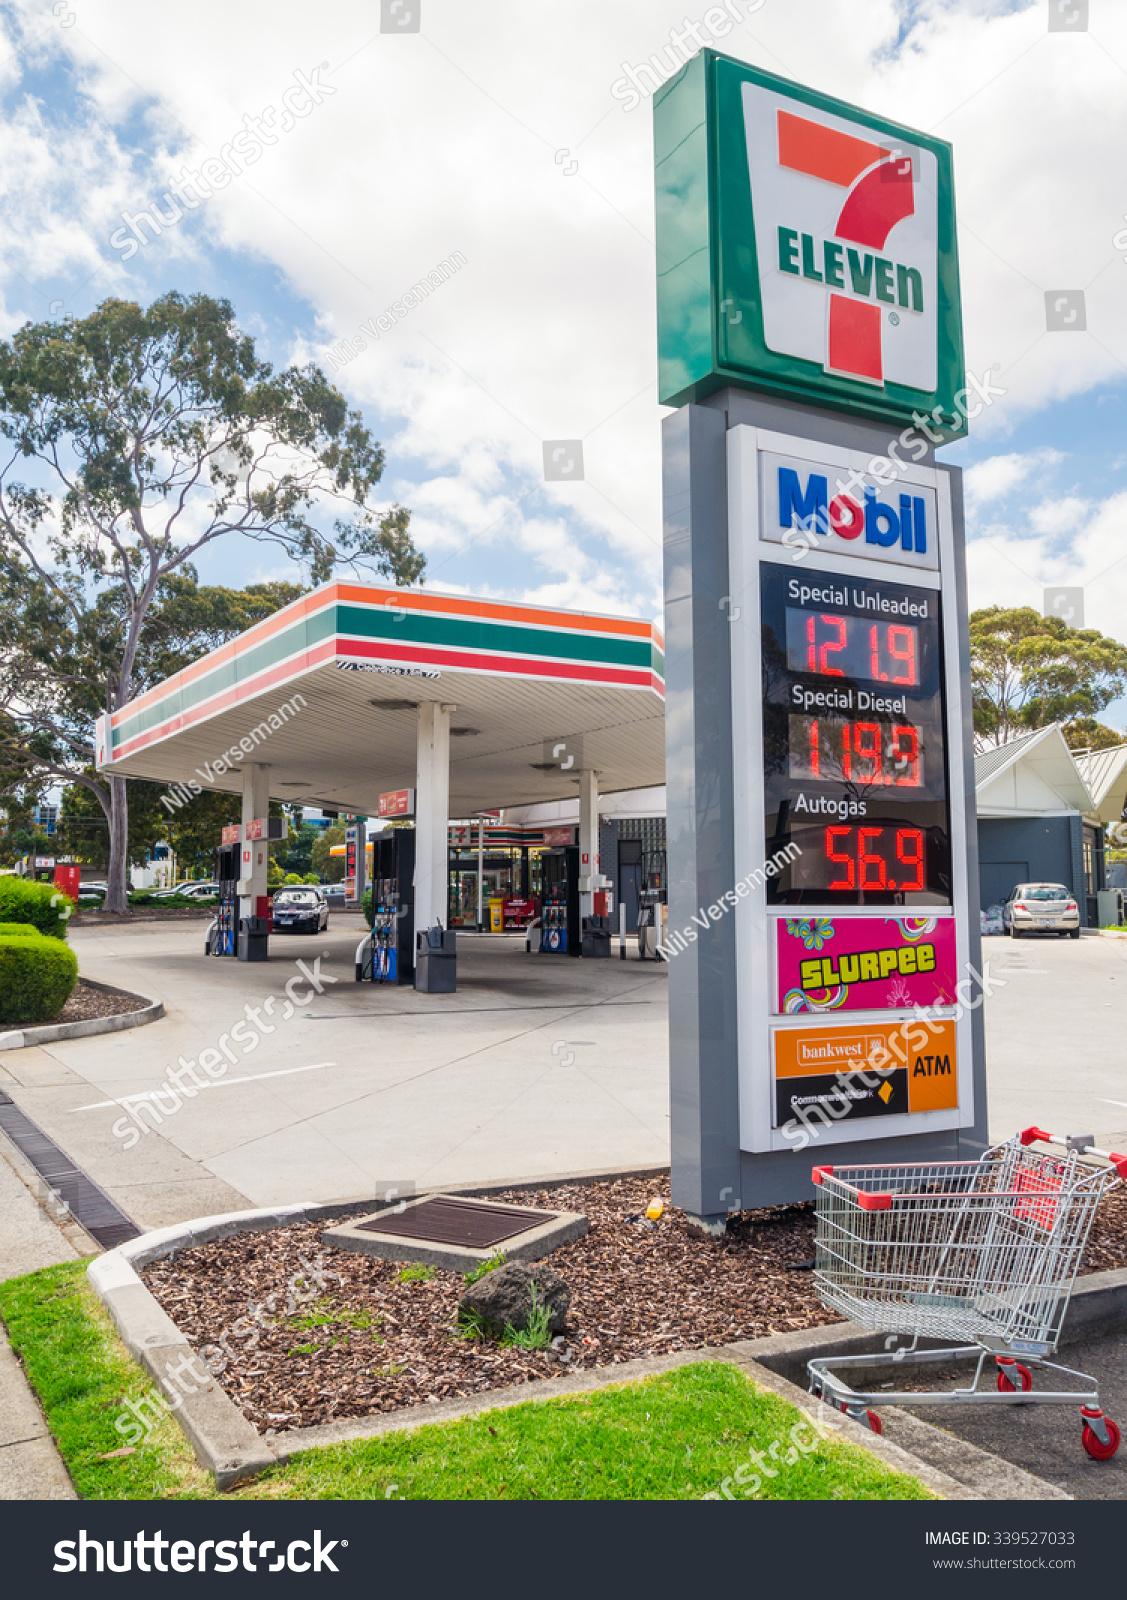 Melbourne australia november 15 2015 2010 stock photo for Mobili convenienti